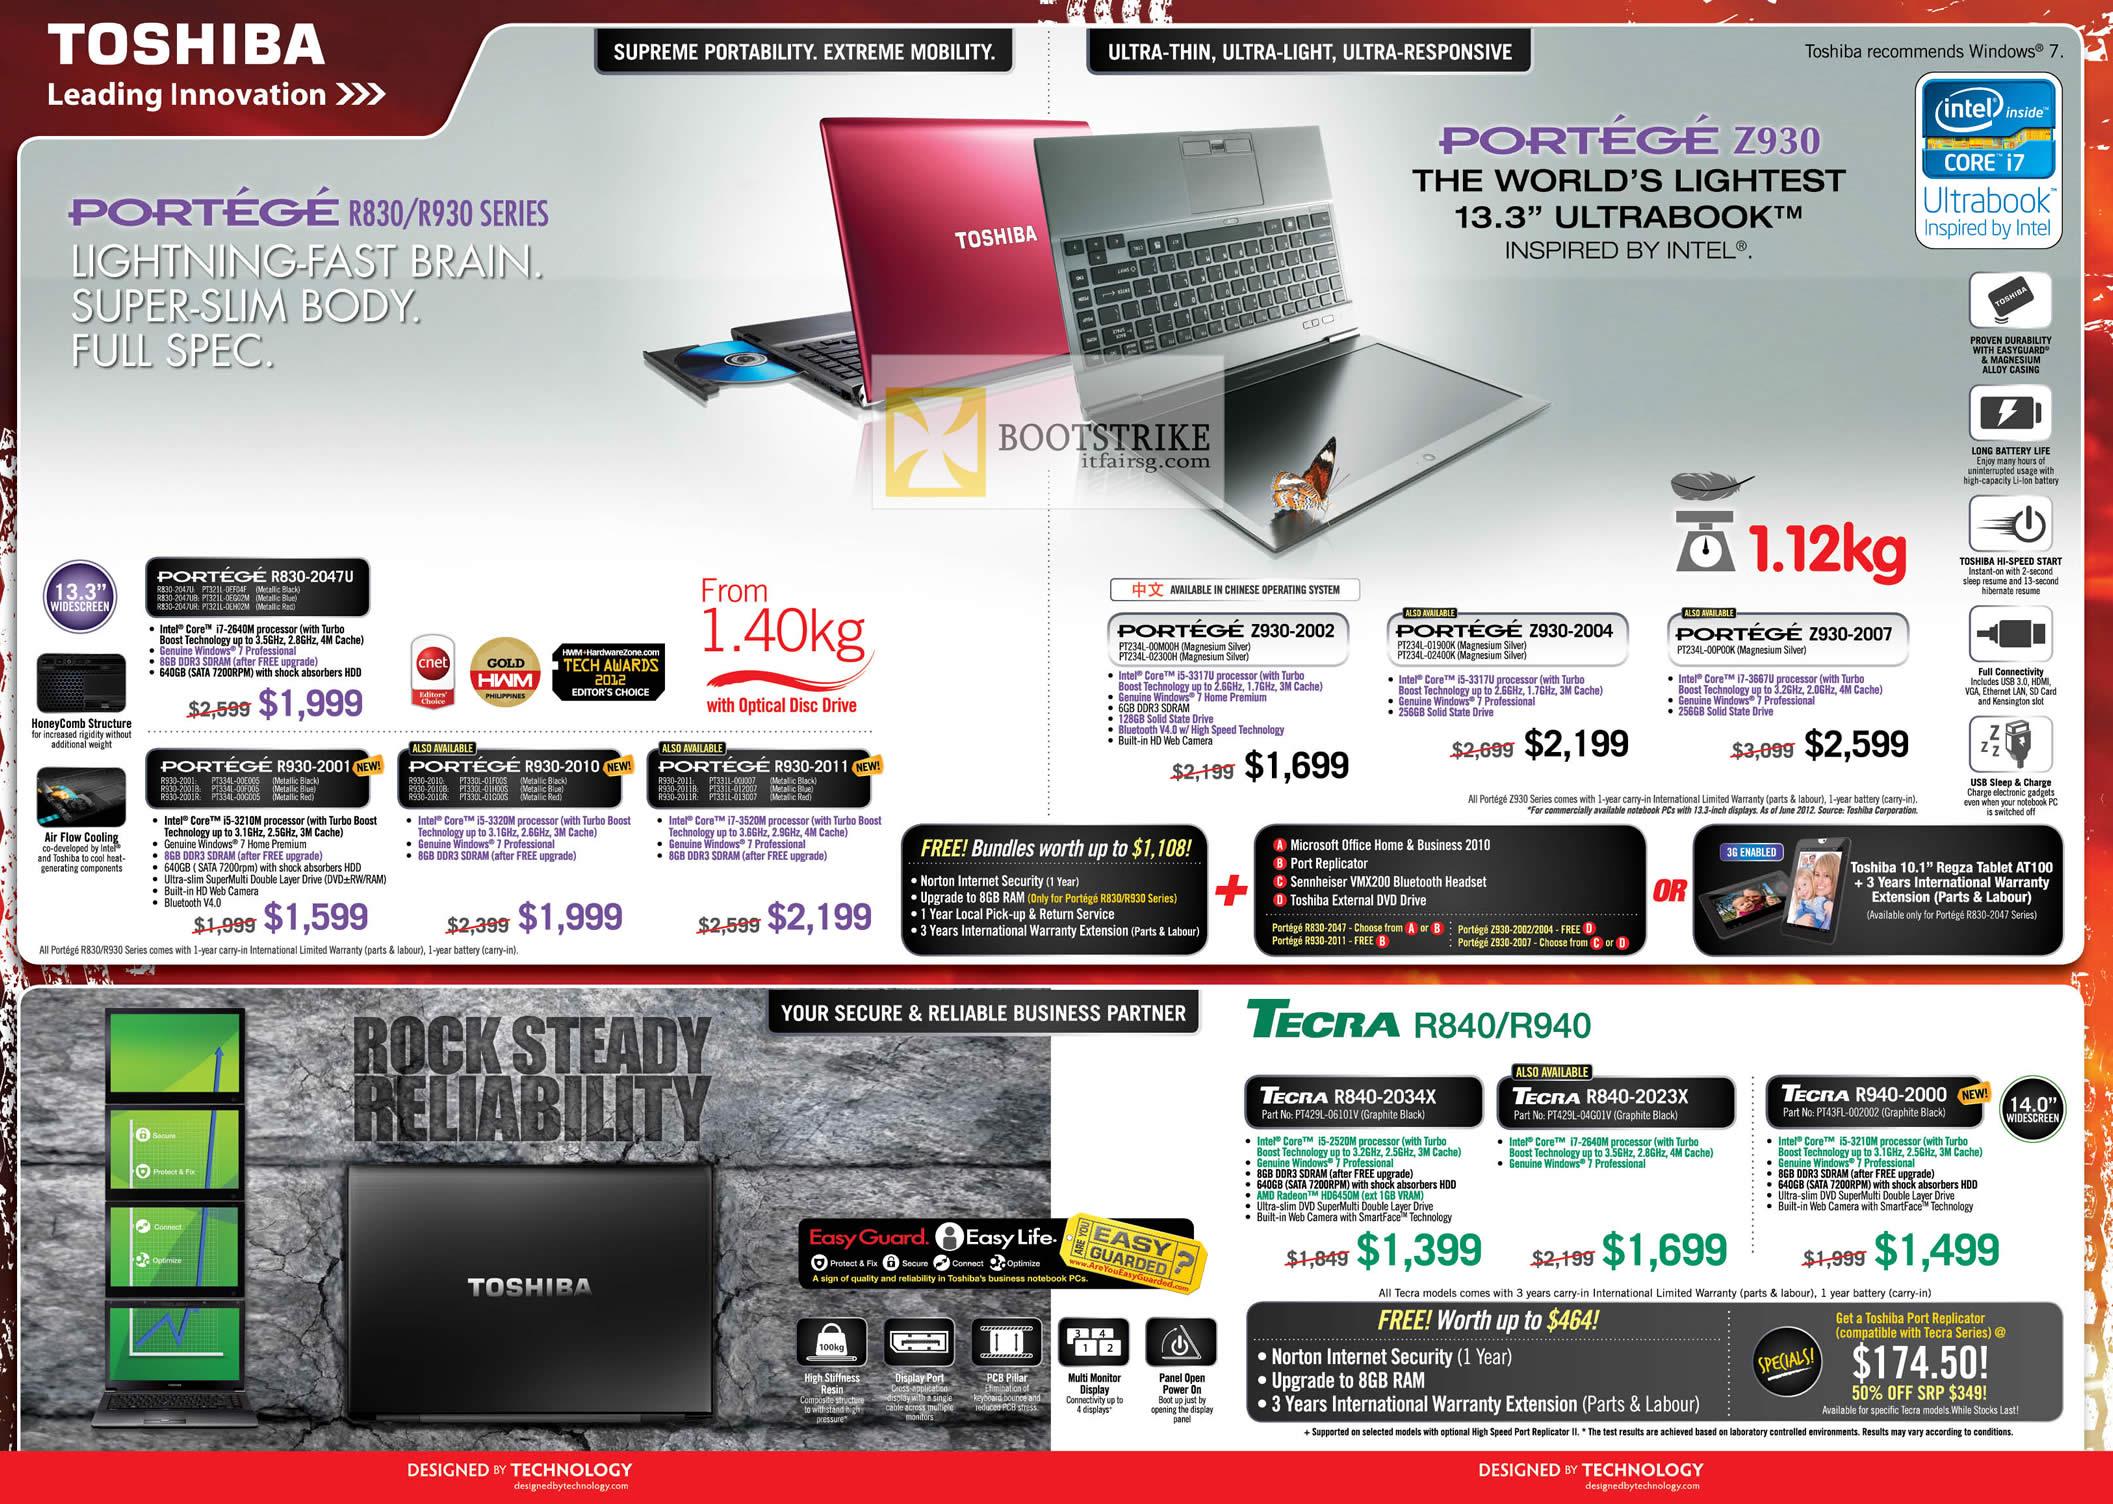 COMEX 2012 price list image brochure of Toshiba Notebooks Portege R830-2047U, R930-2001 2010 2011, Z930 2002 2004 2007, Tecra R840 2034X 2023X, R940-2000